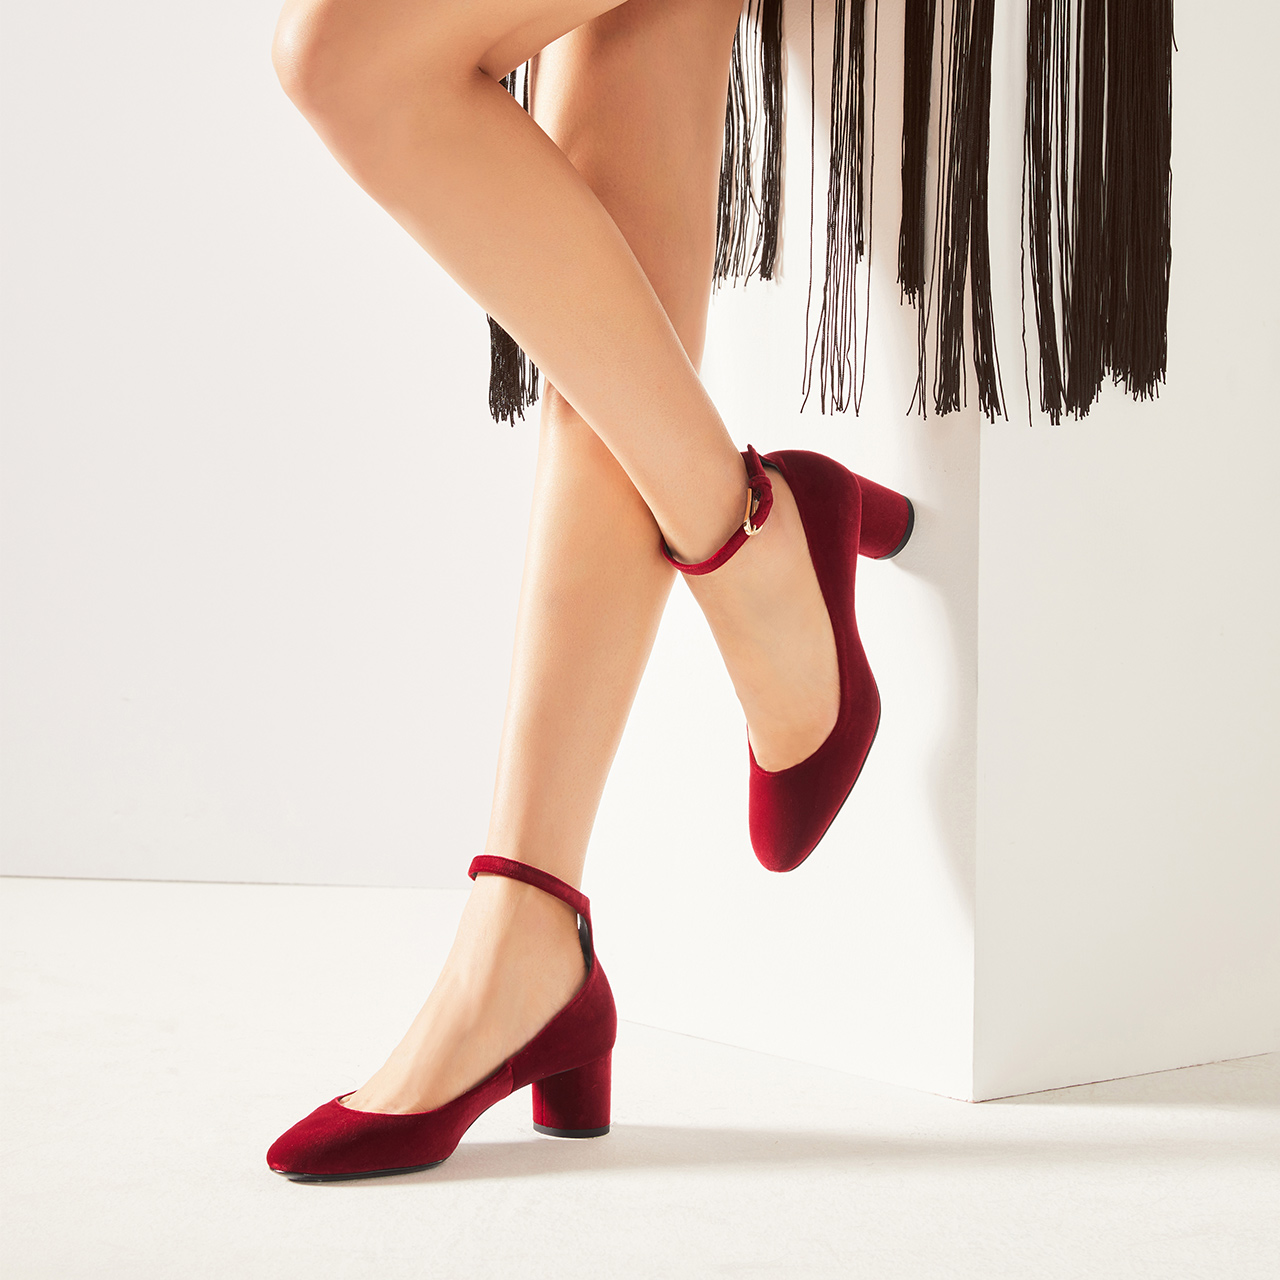 STELLA LUNA女鞋秋冬新品天鵝絨一字扣粗跟單鞋女婚鞋SH333F22170